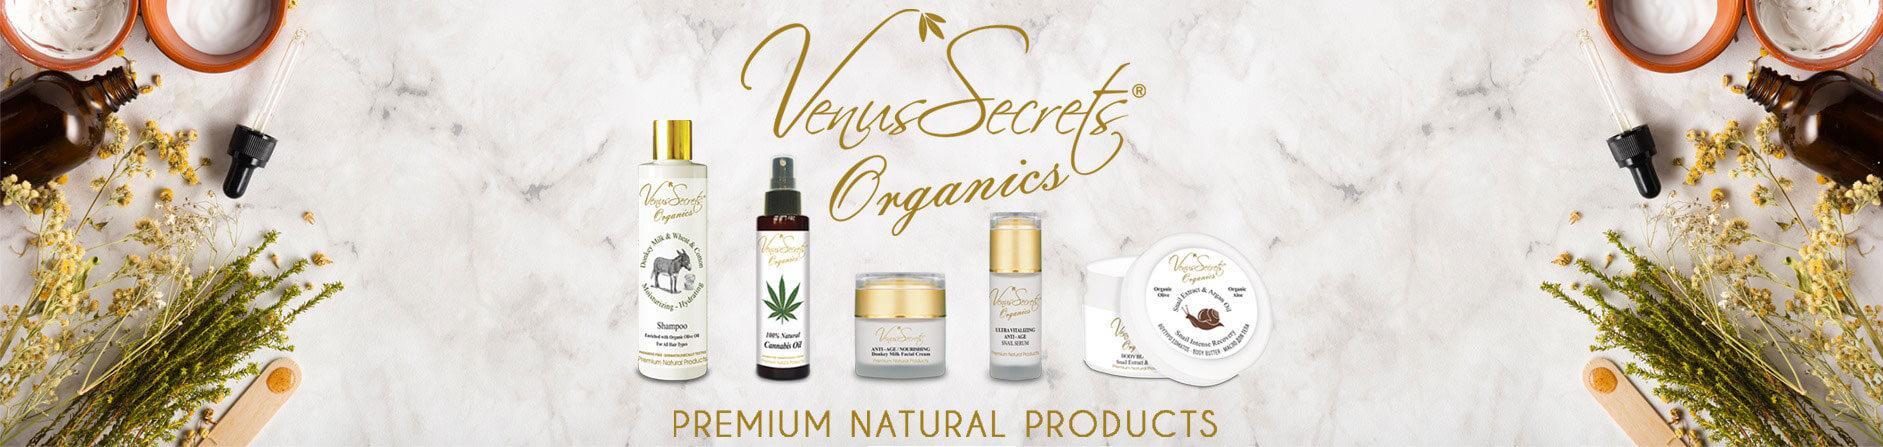 Venus Secrets Header banner